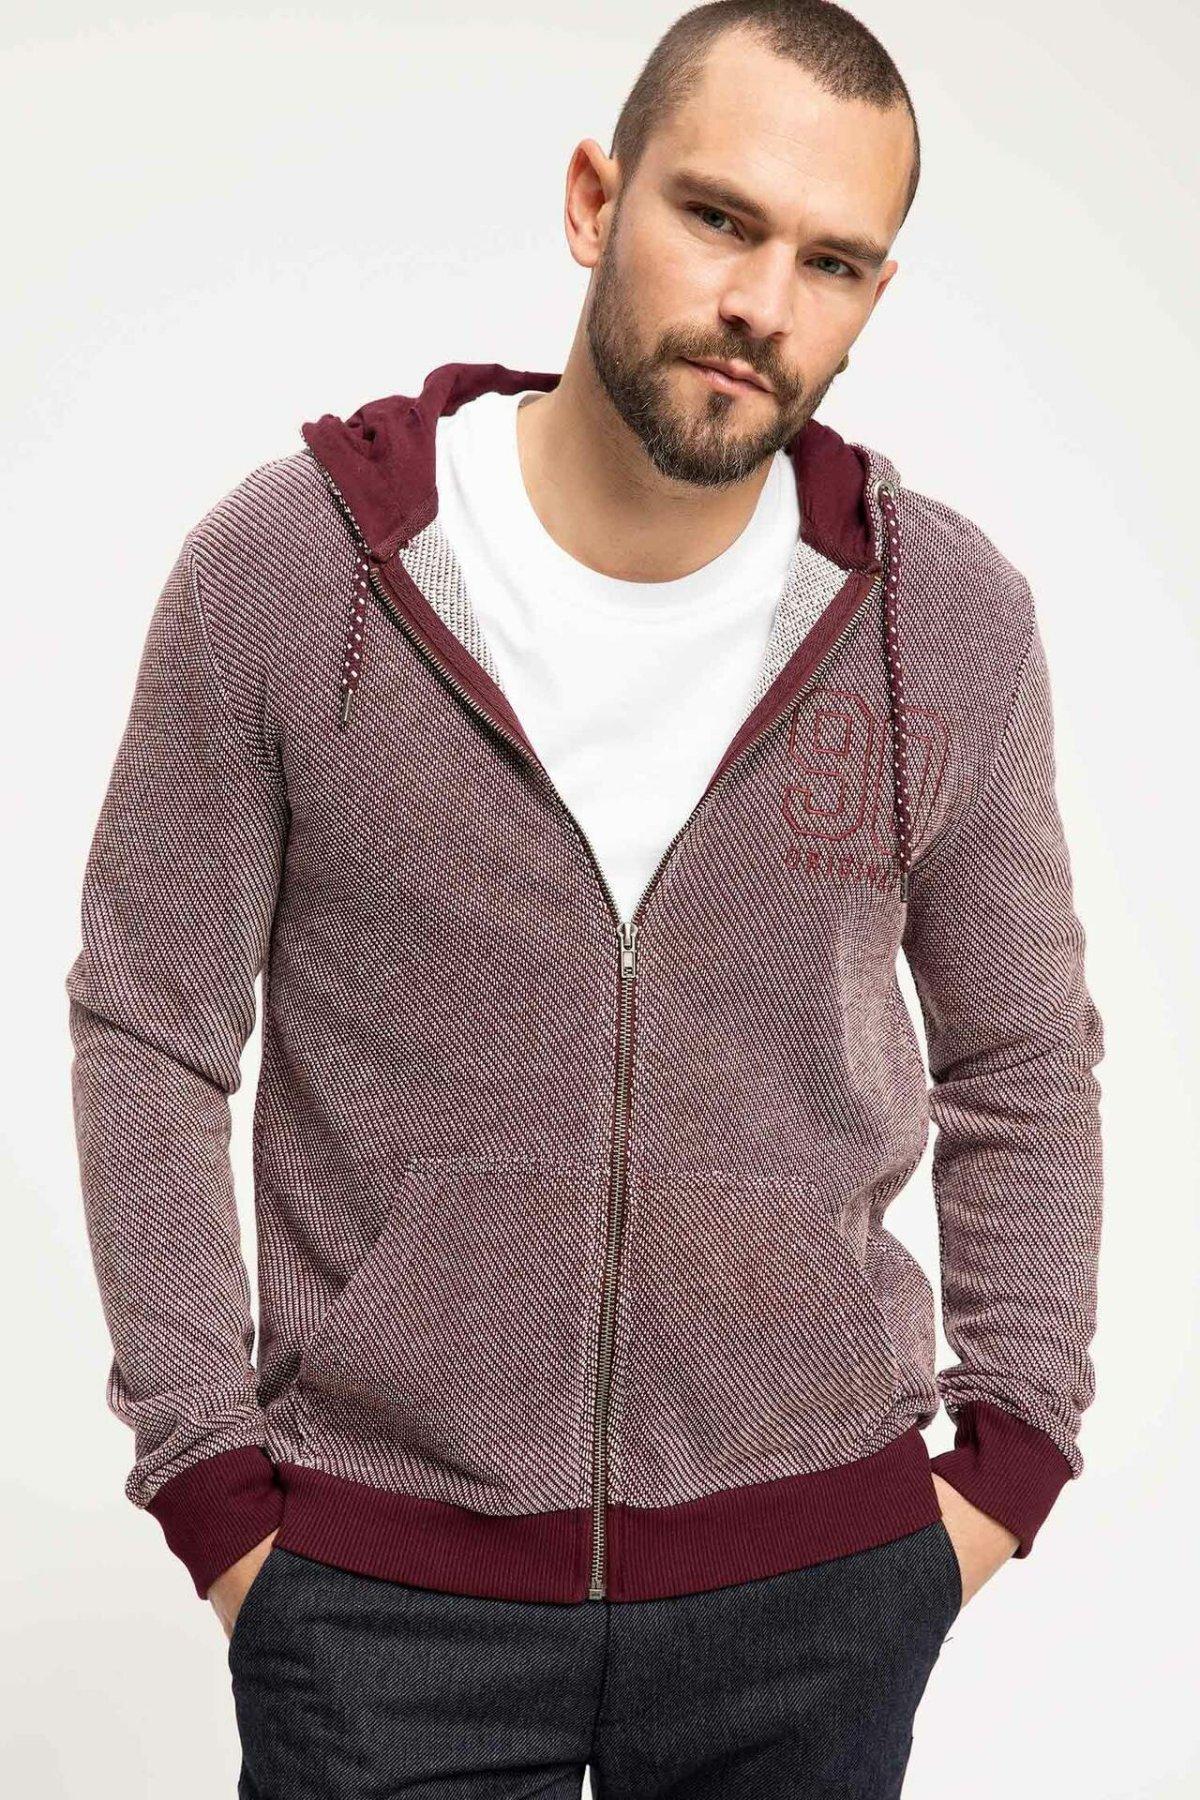 DeFacto Fashion Man Cardigan Hooded Coats Autumn Male Casual High Quality Jackets Men's Cotton Coats New-J3767AZ18WN